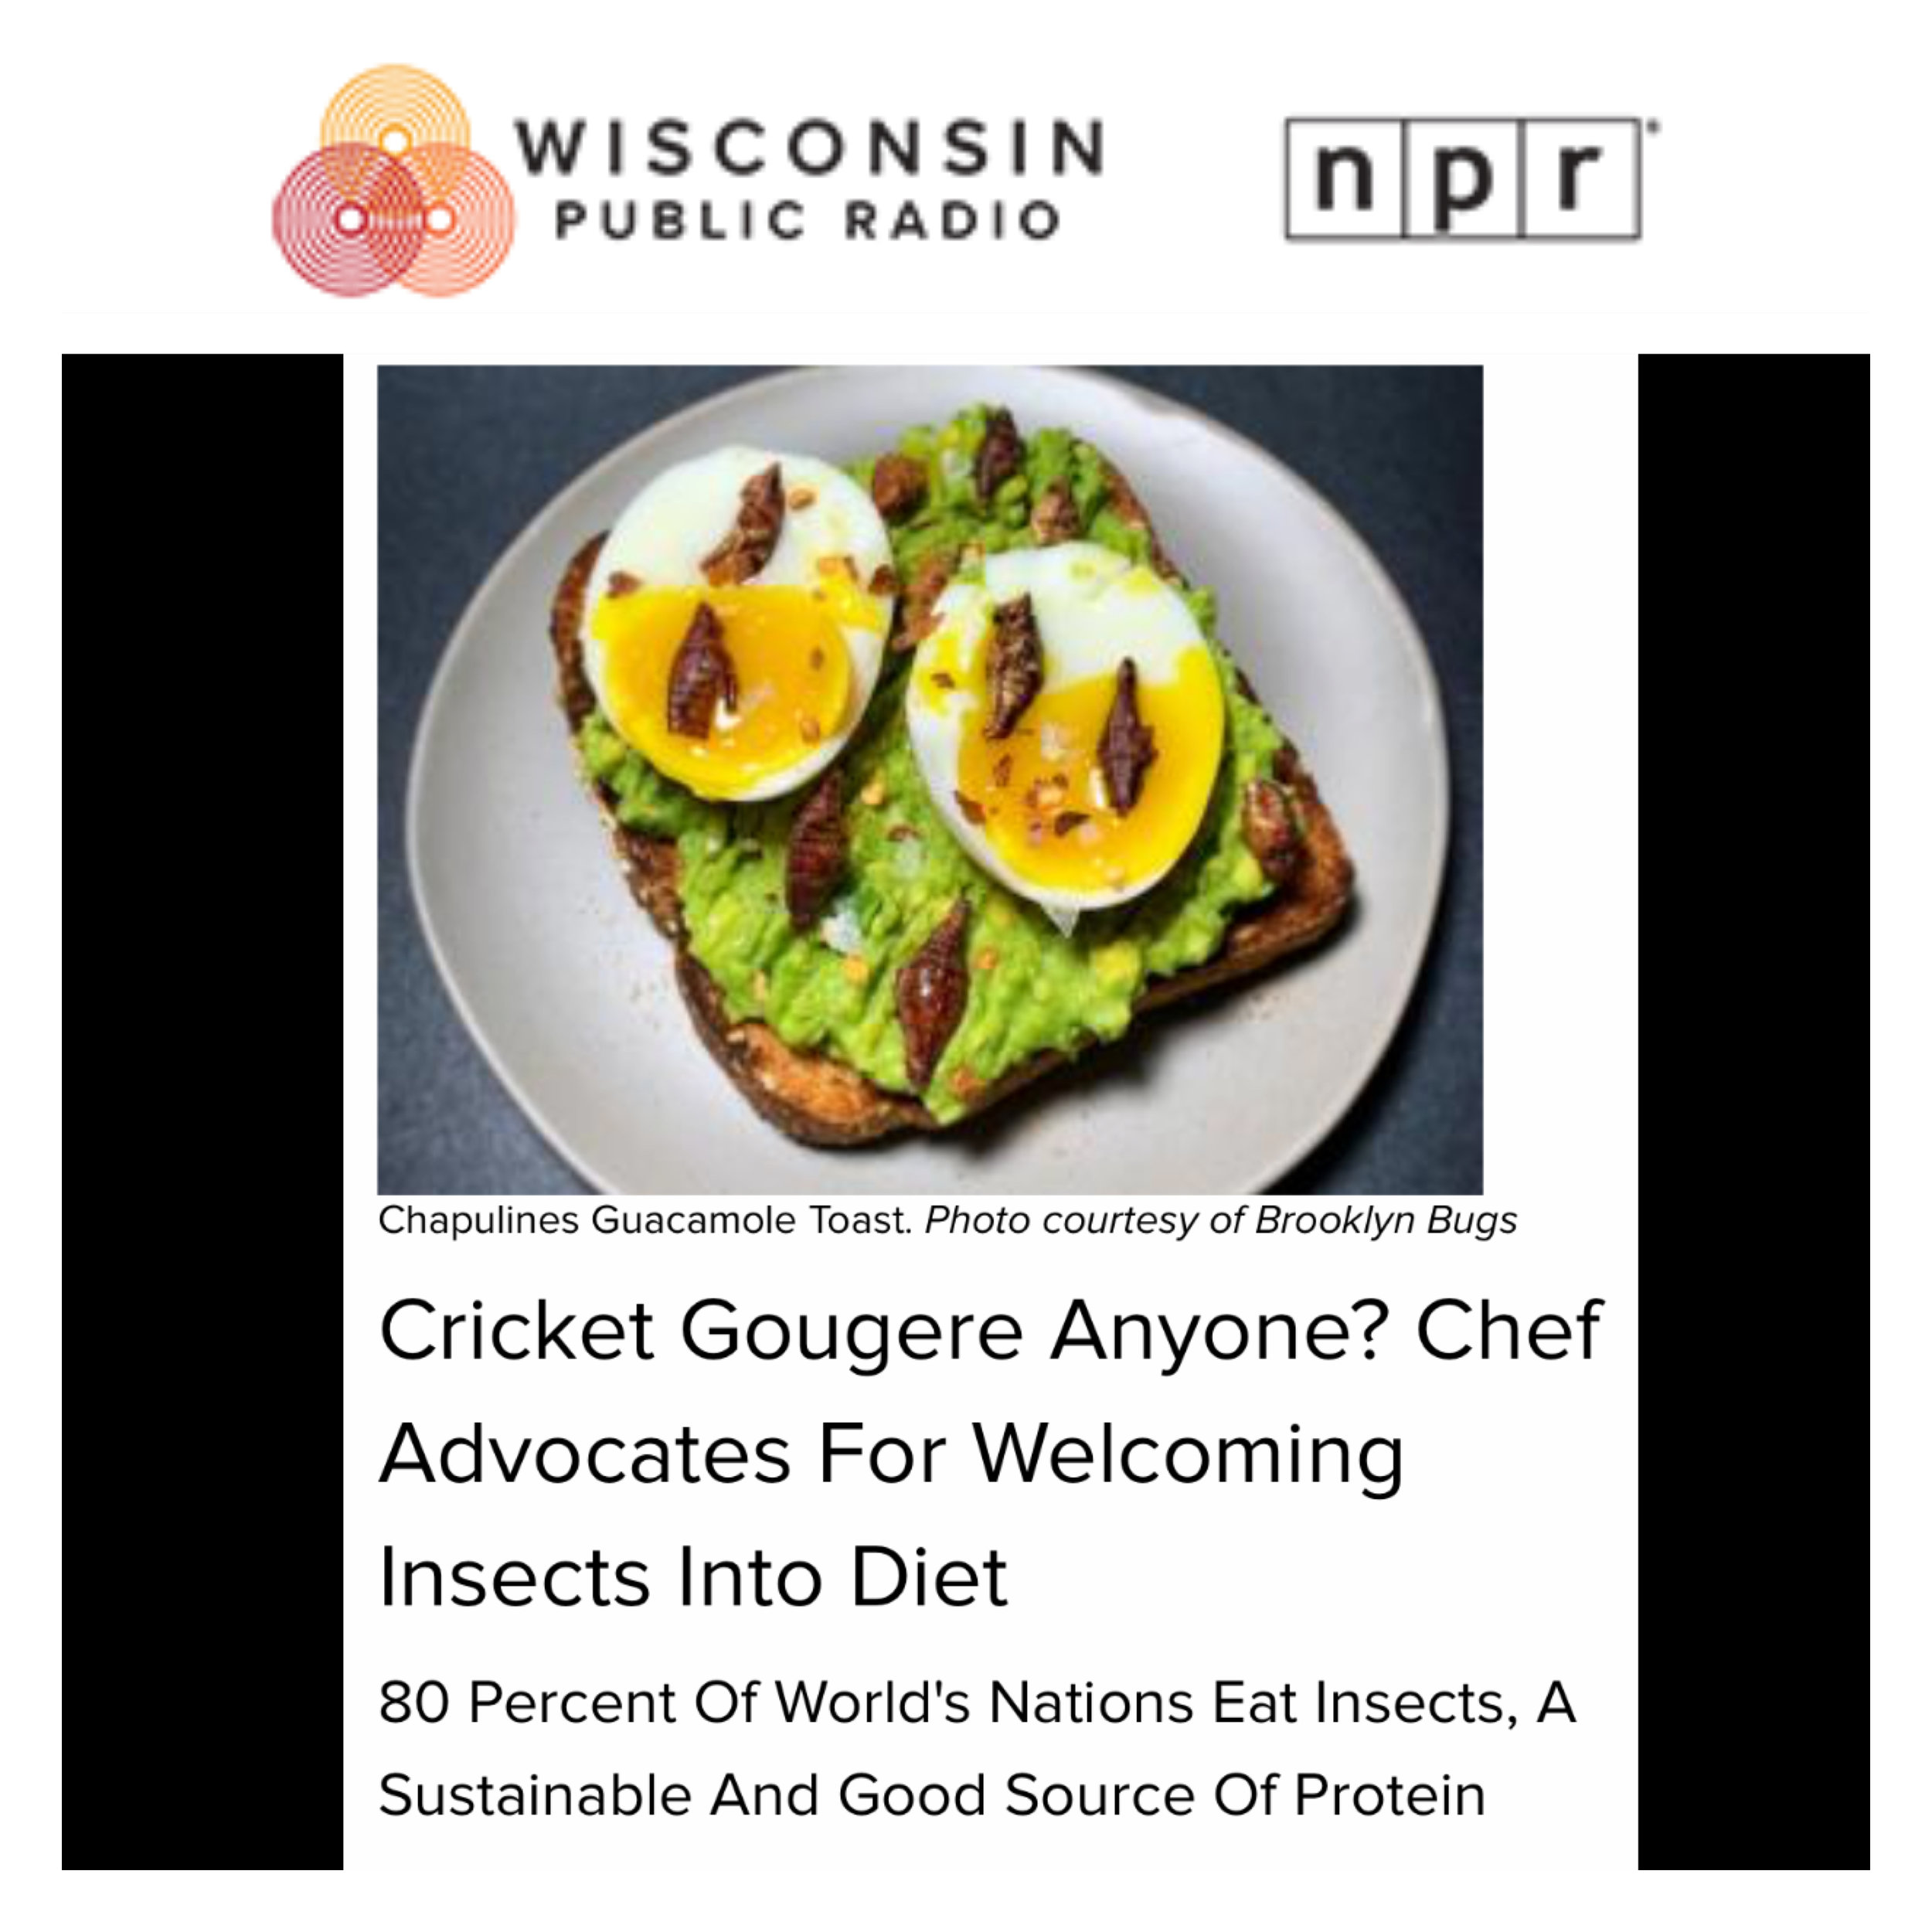 WI NPR.jpg